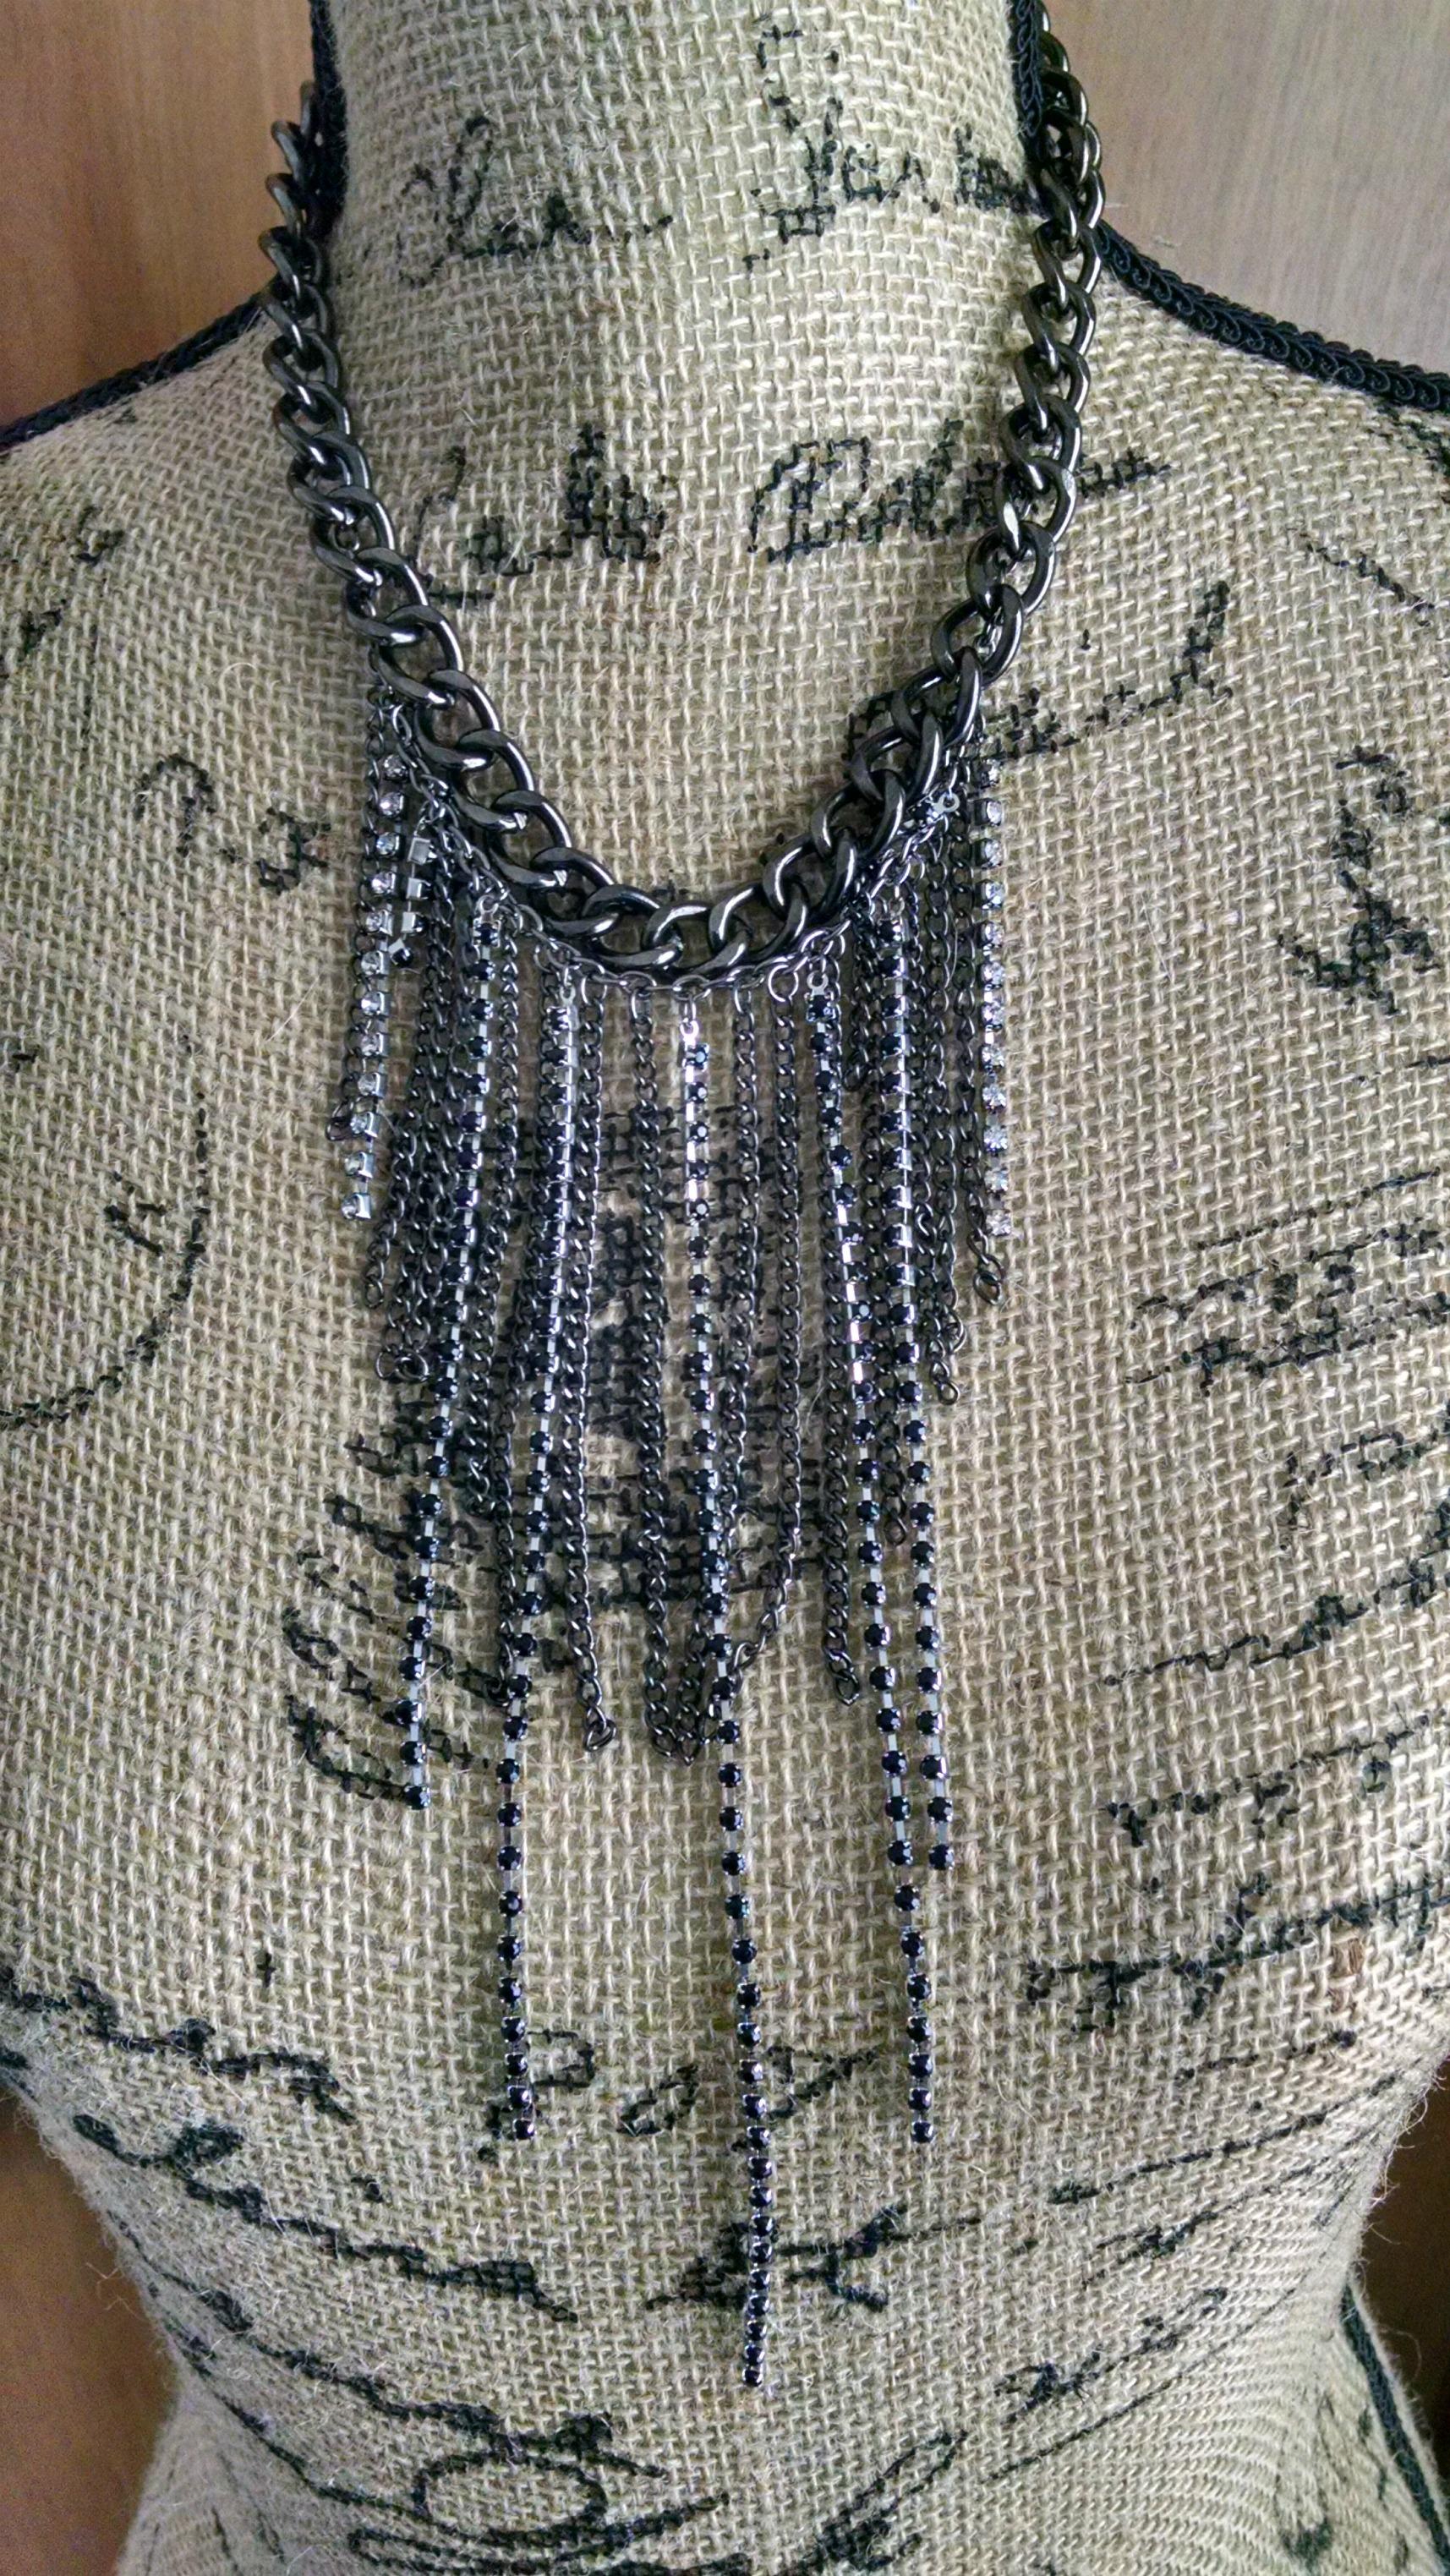 Chain links & black rhinestones